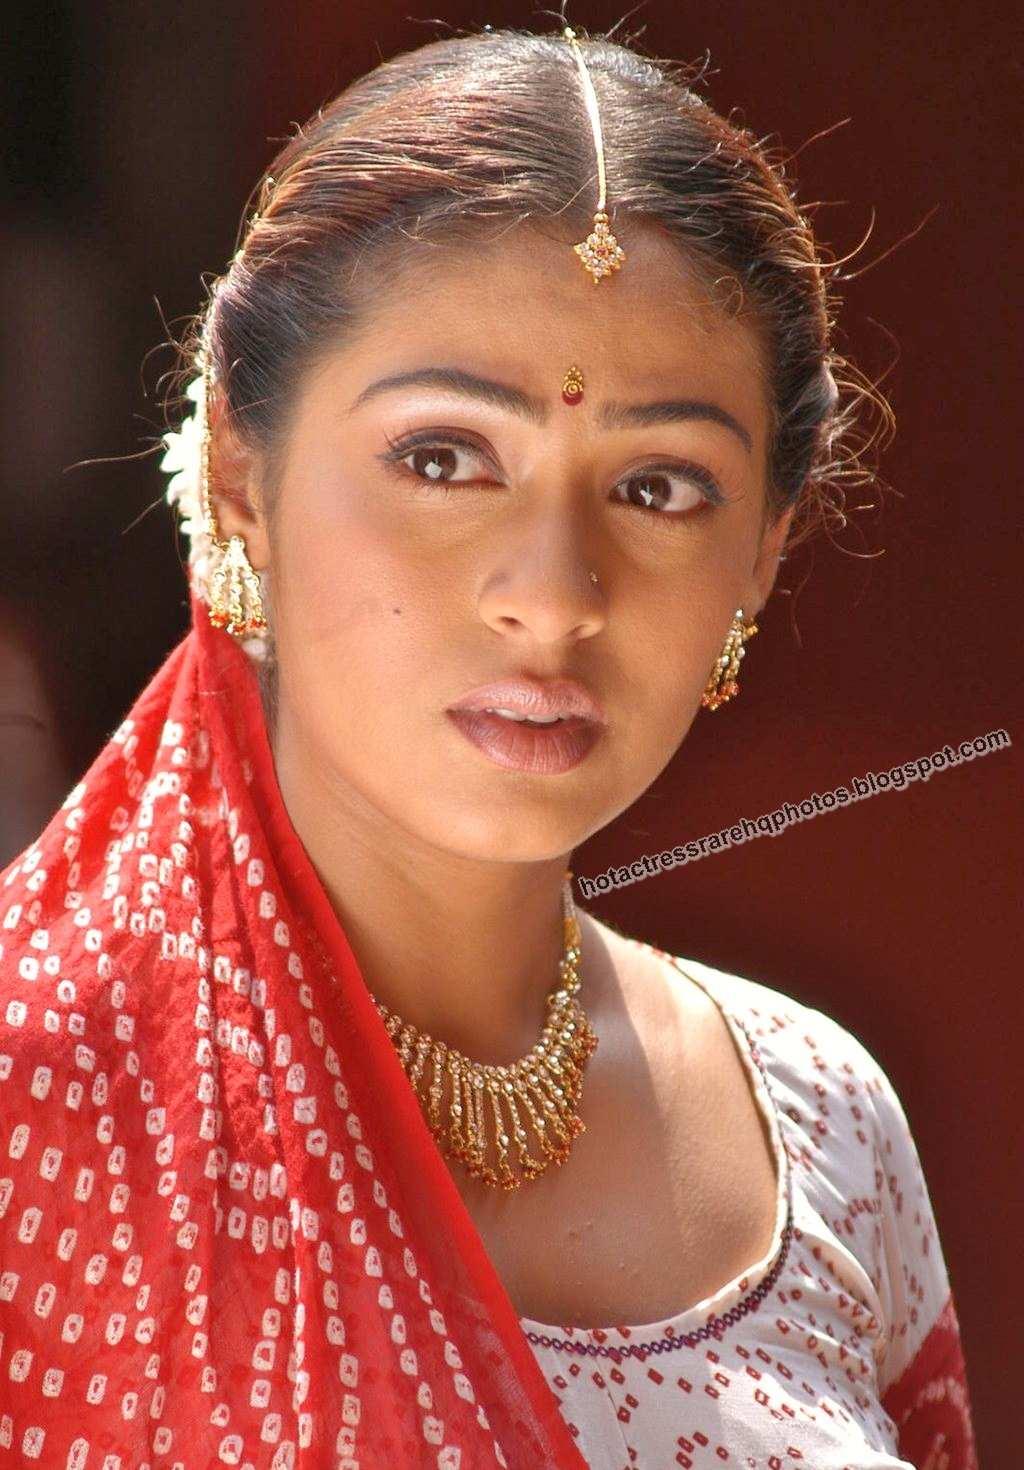 tamil actress sada photoshoot hottest telugu stills navel indian hq lehenga unreleased rare uhq